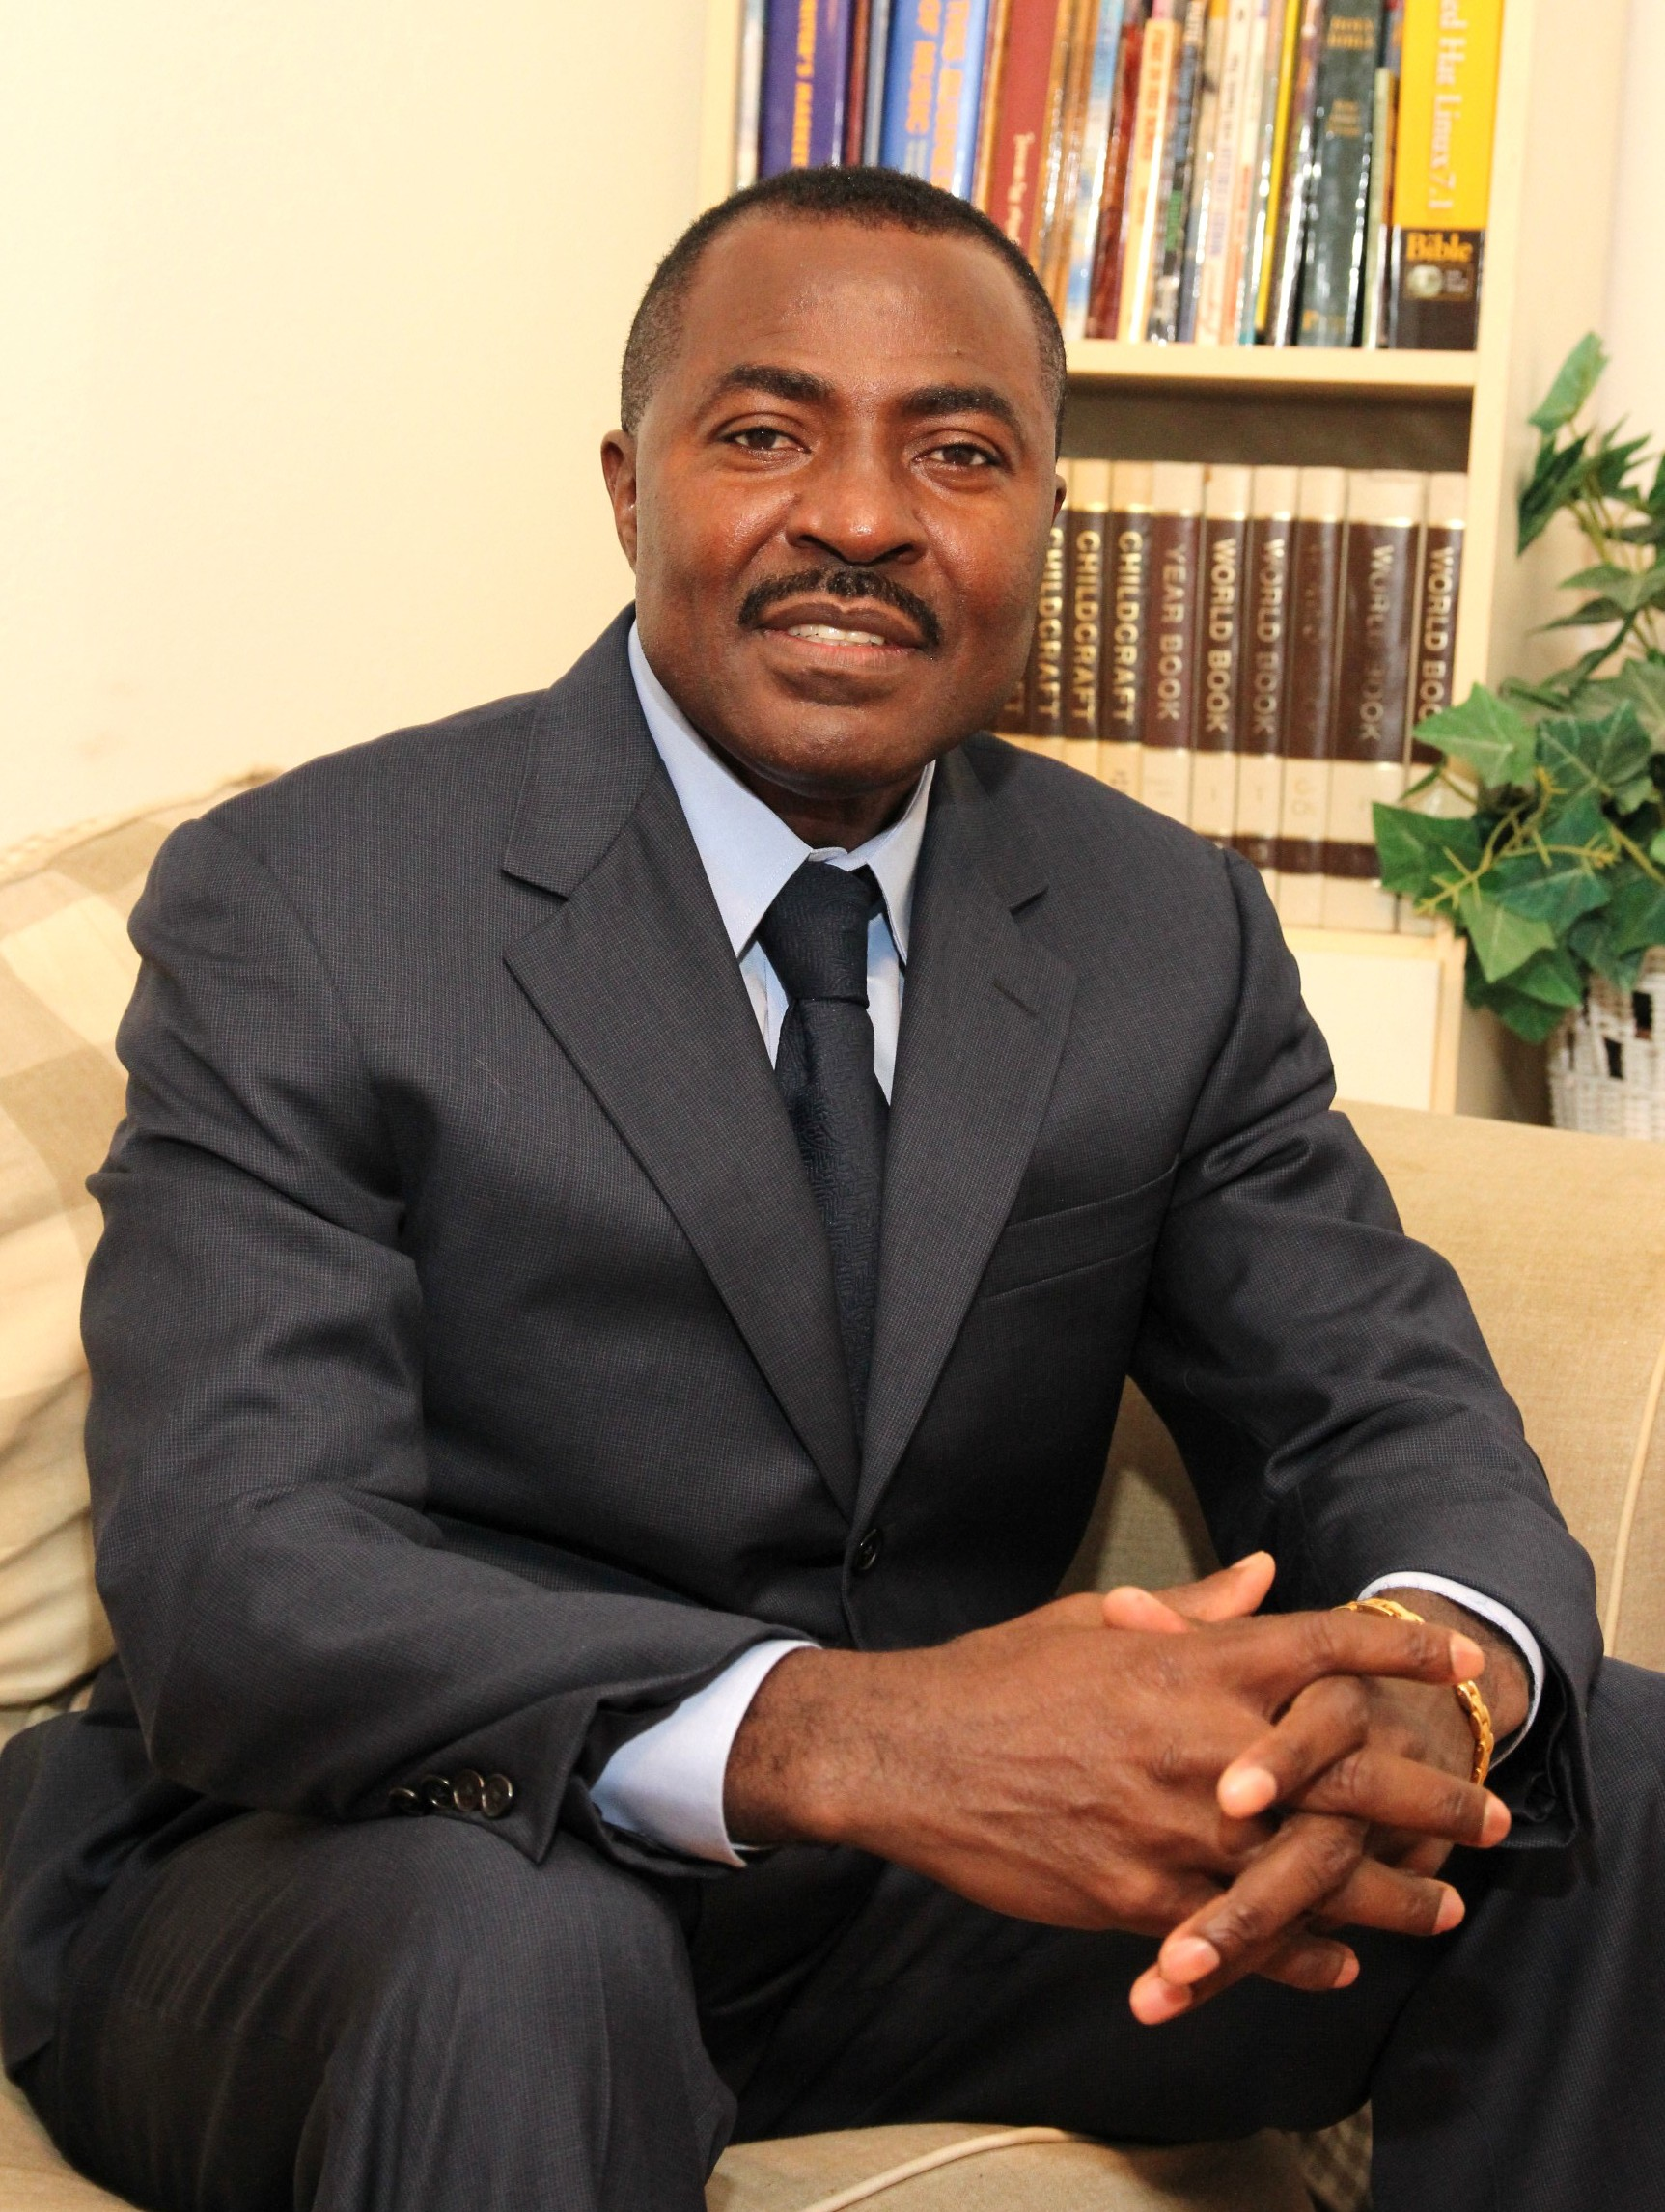 Pastor Godwin E. Enogieru